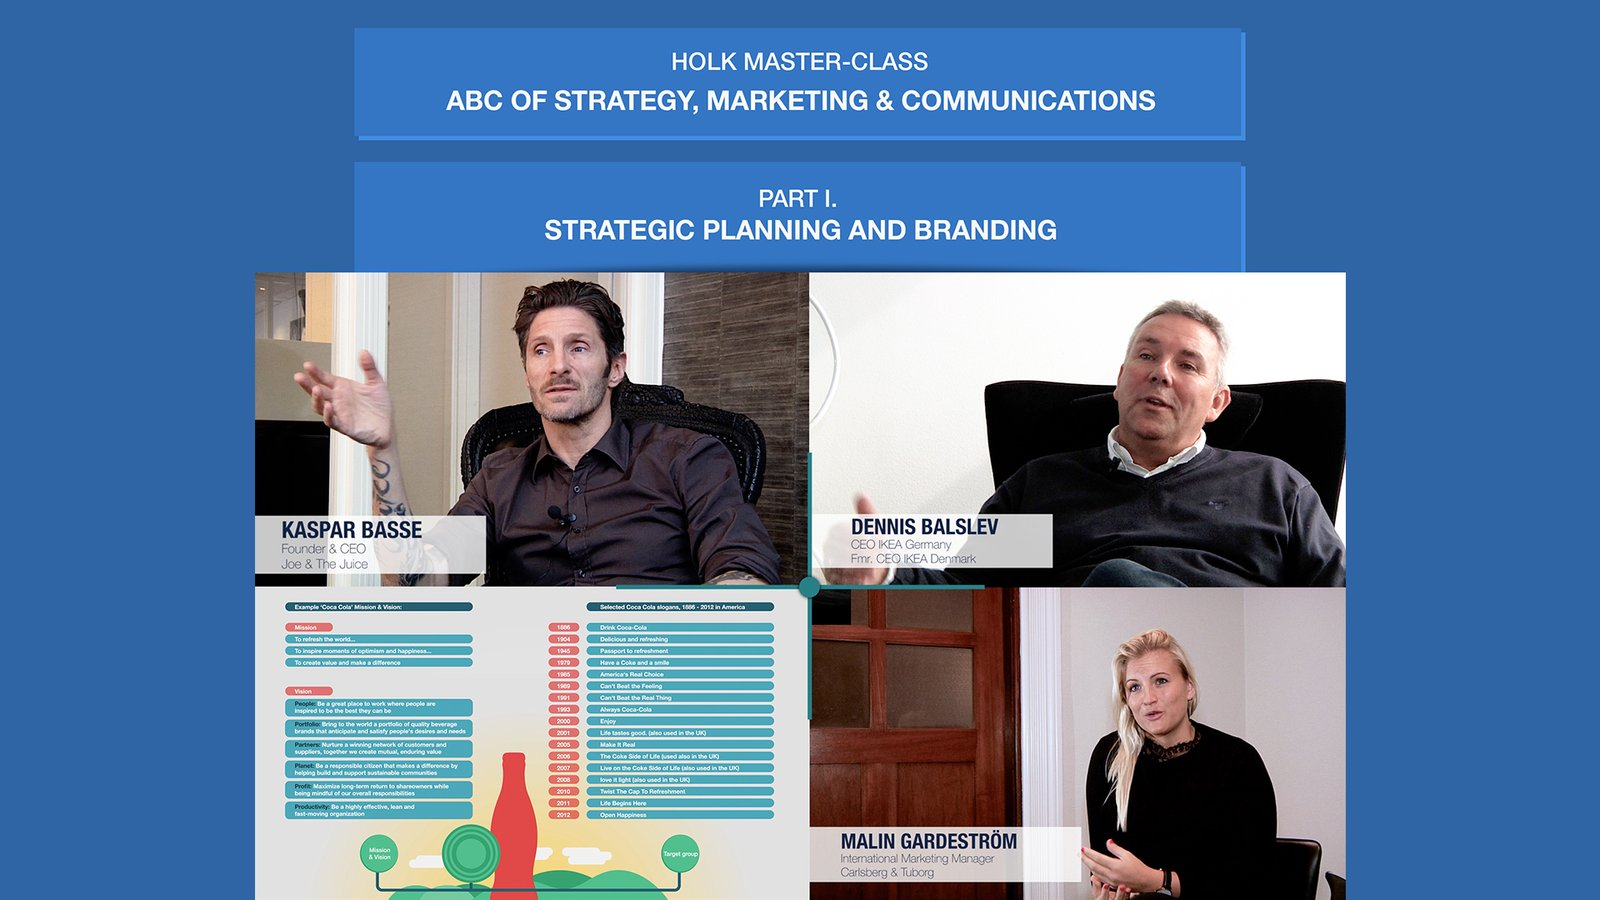 Part 1: Strategic Planning and Branding